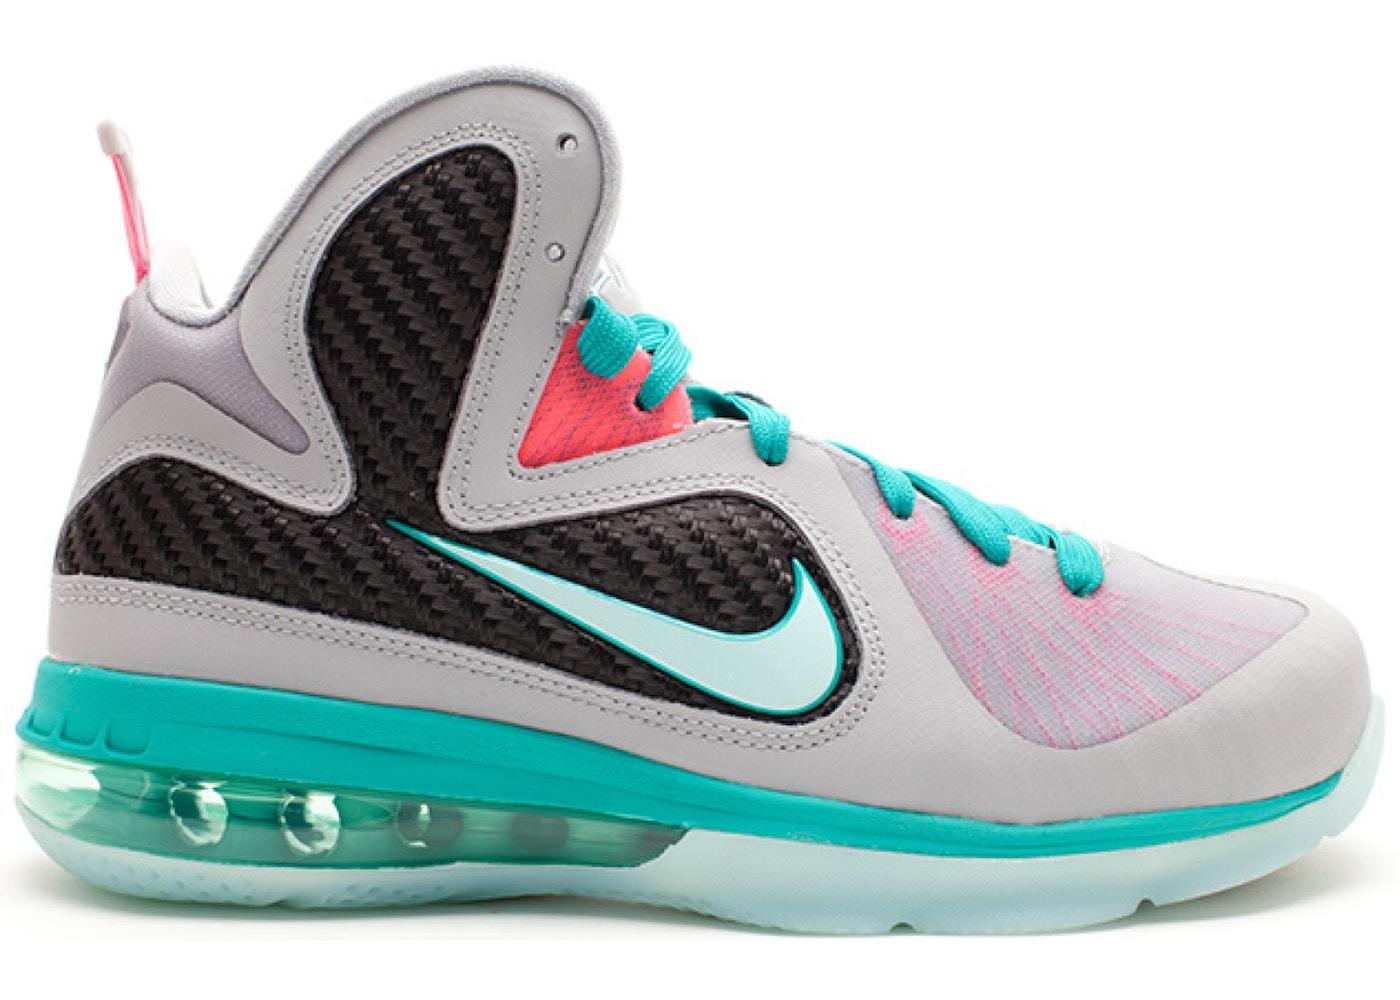 los angeles ed949 08dd5 Nike LeBron 9 Shoes - Average Sale Price